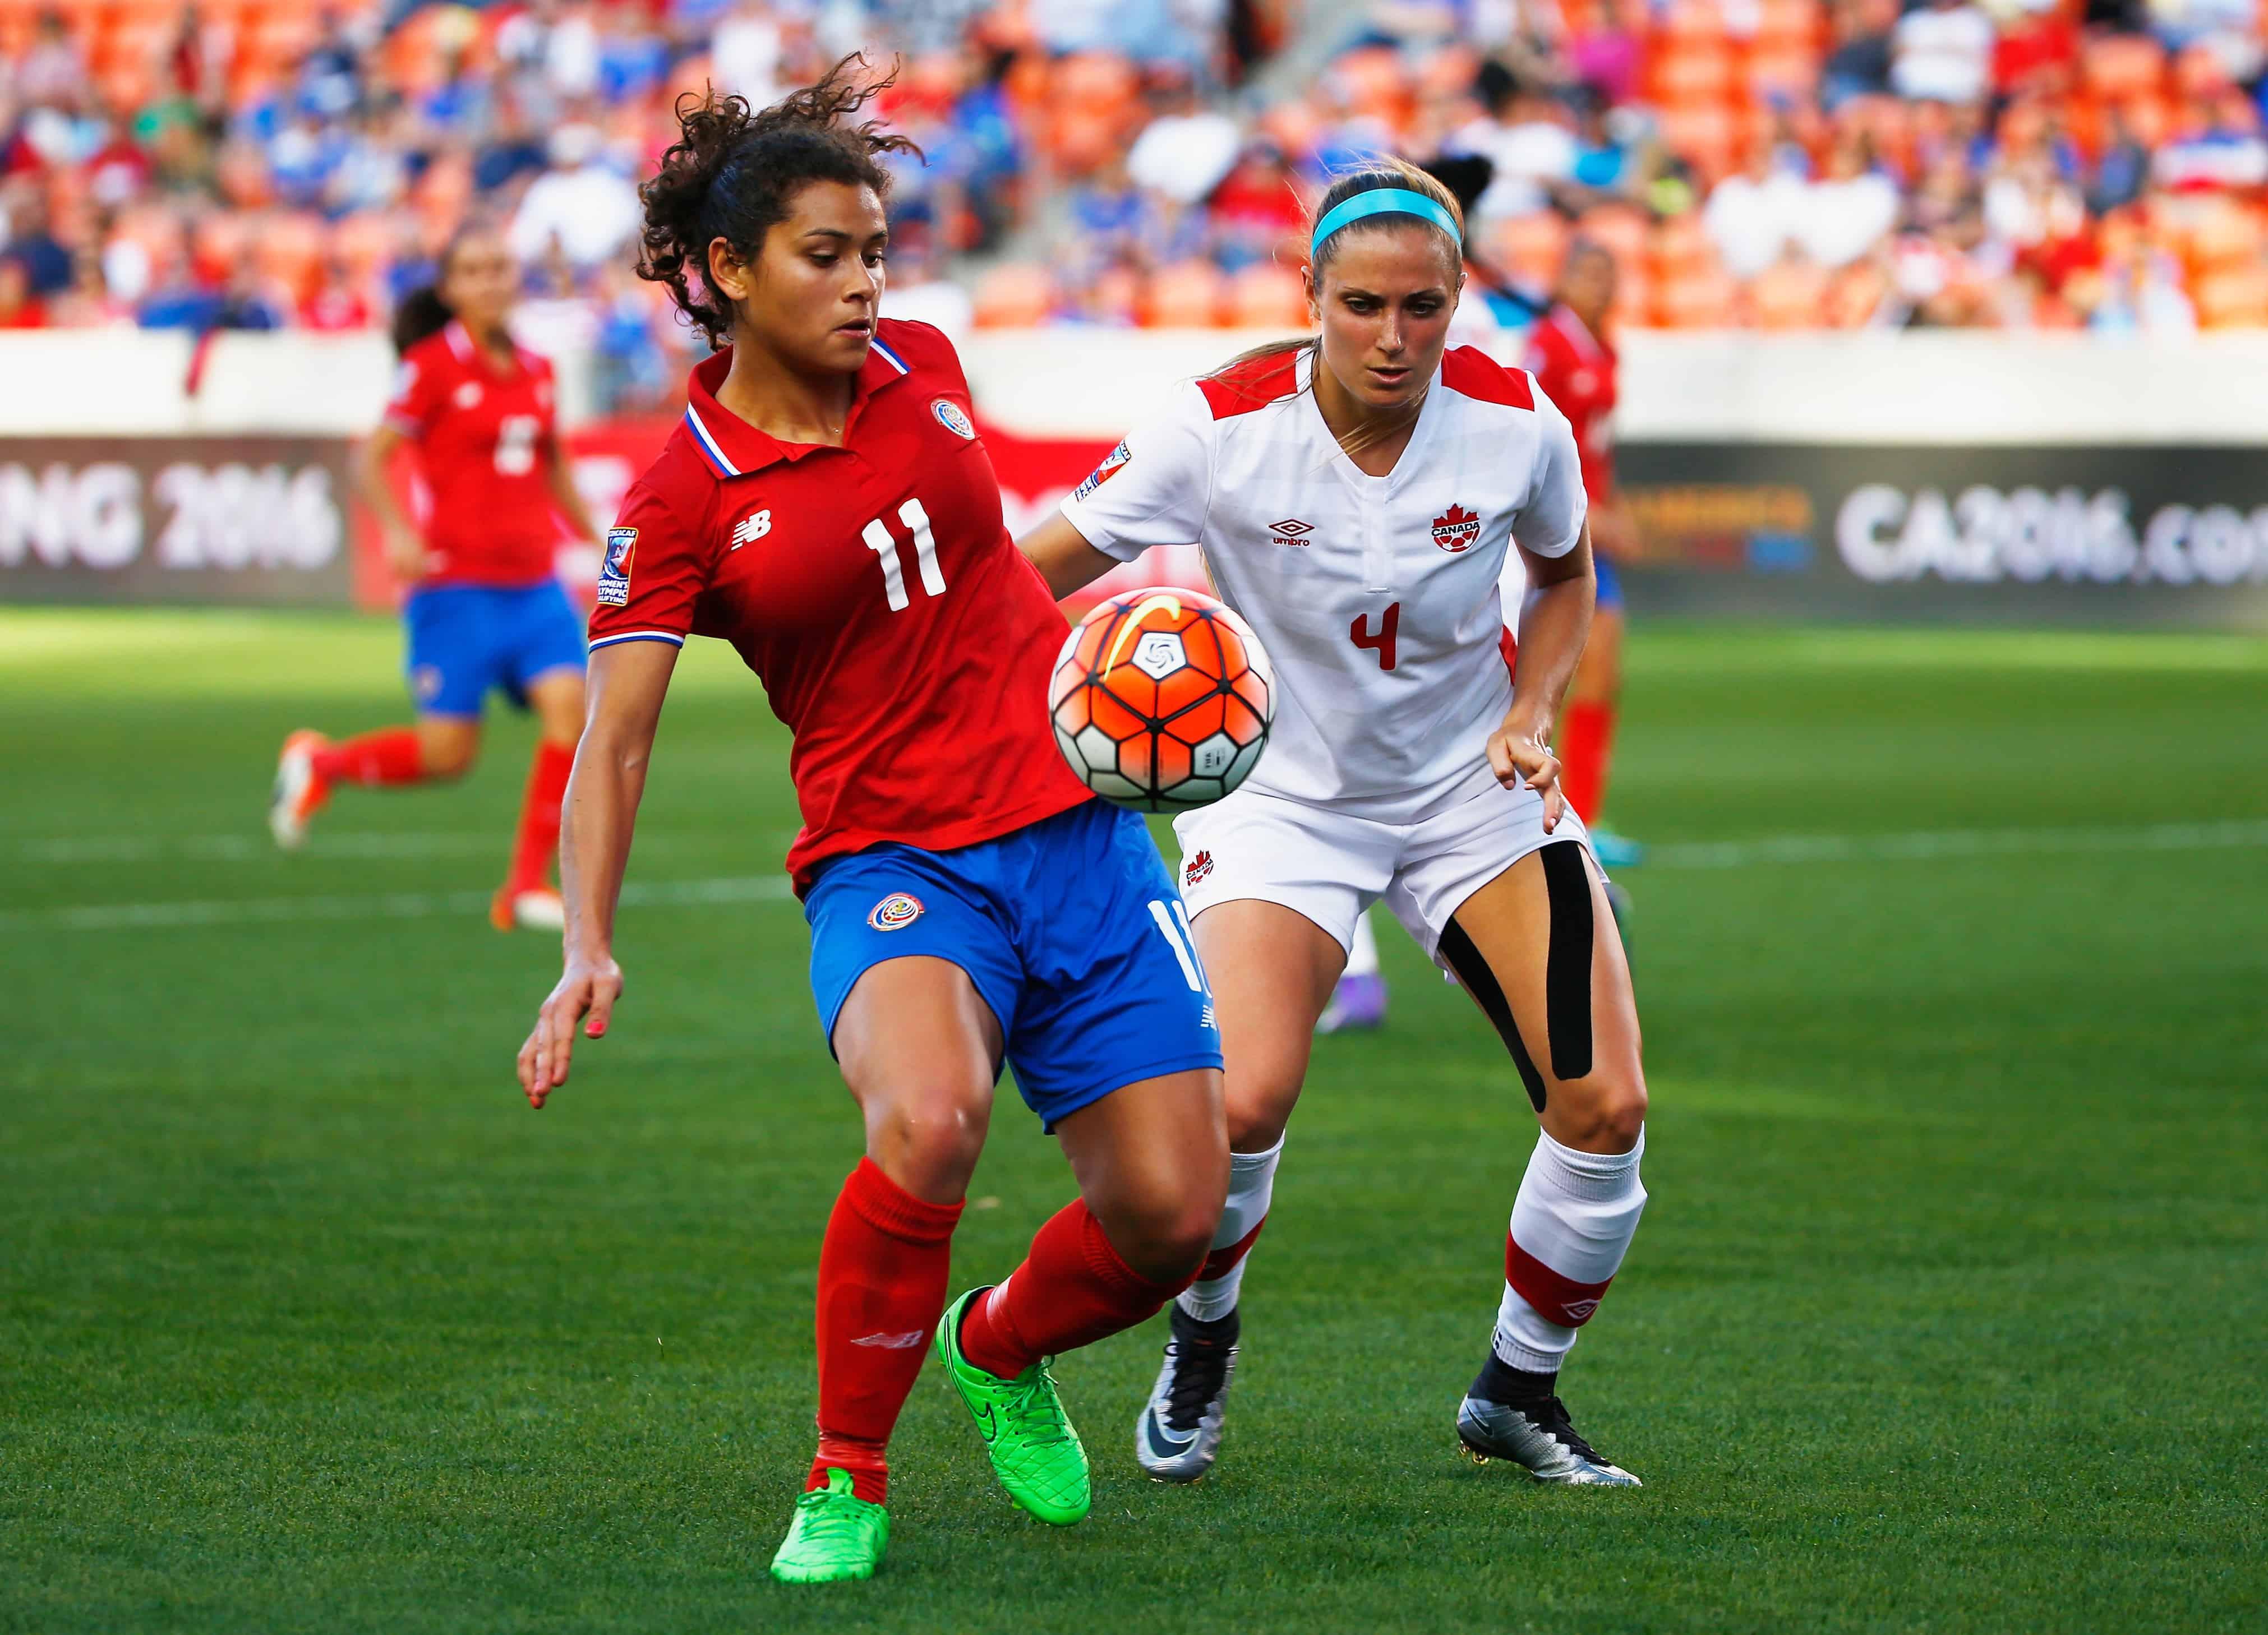 costa rica women's football: Sheilina Zadorsky and Raquel Rodriguez